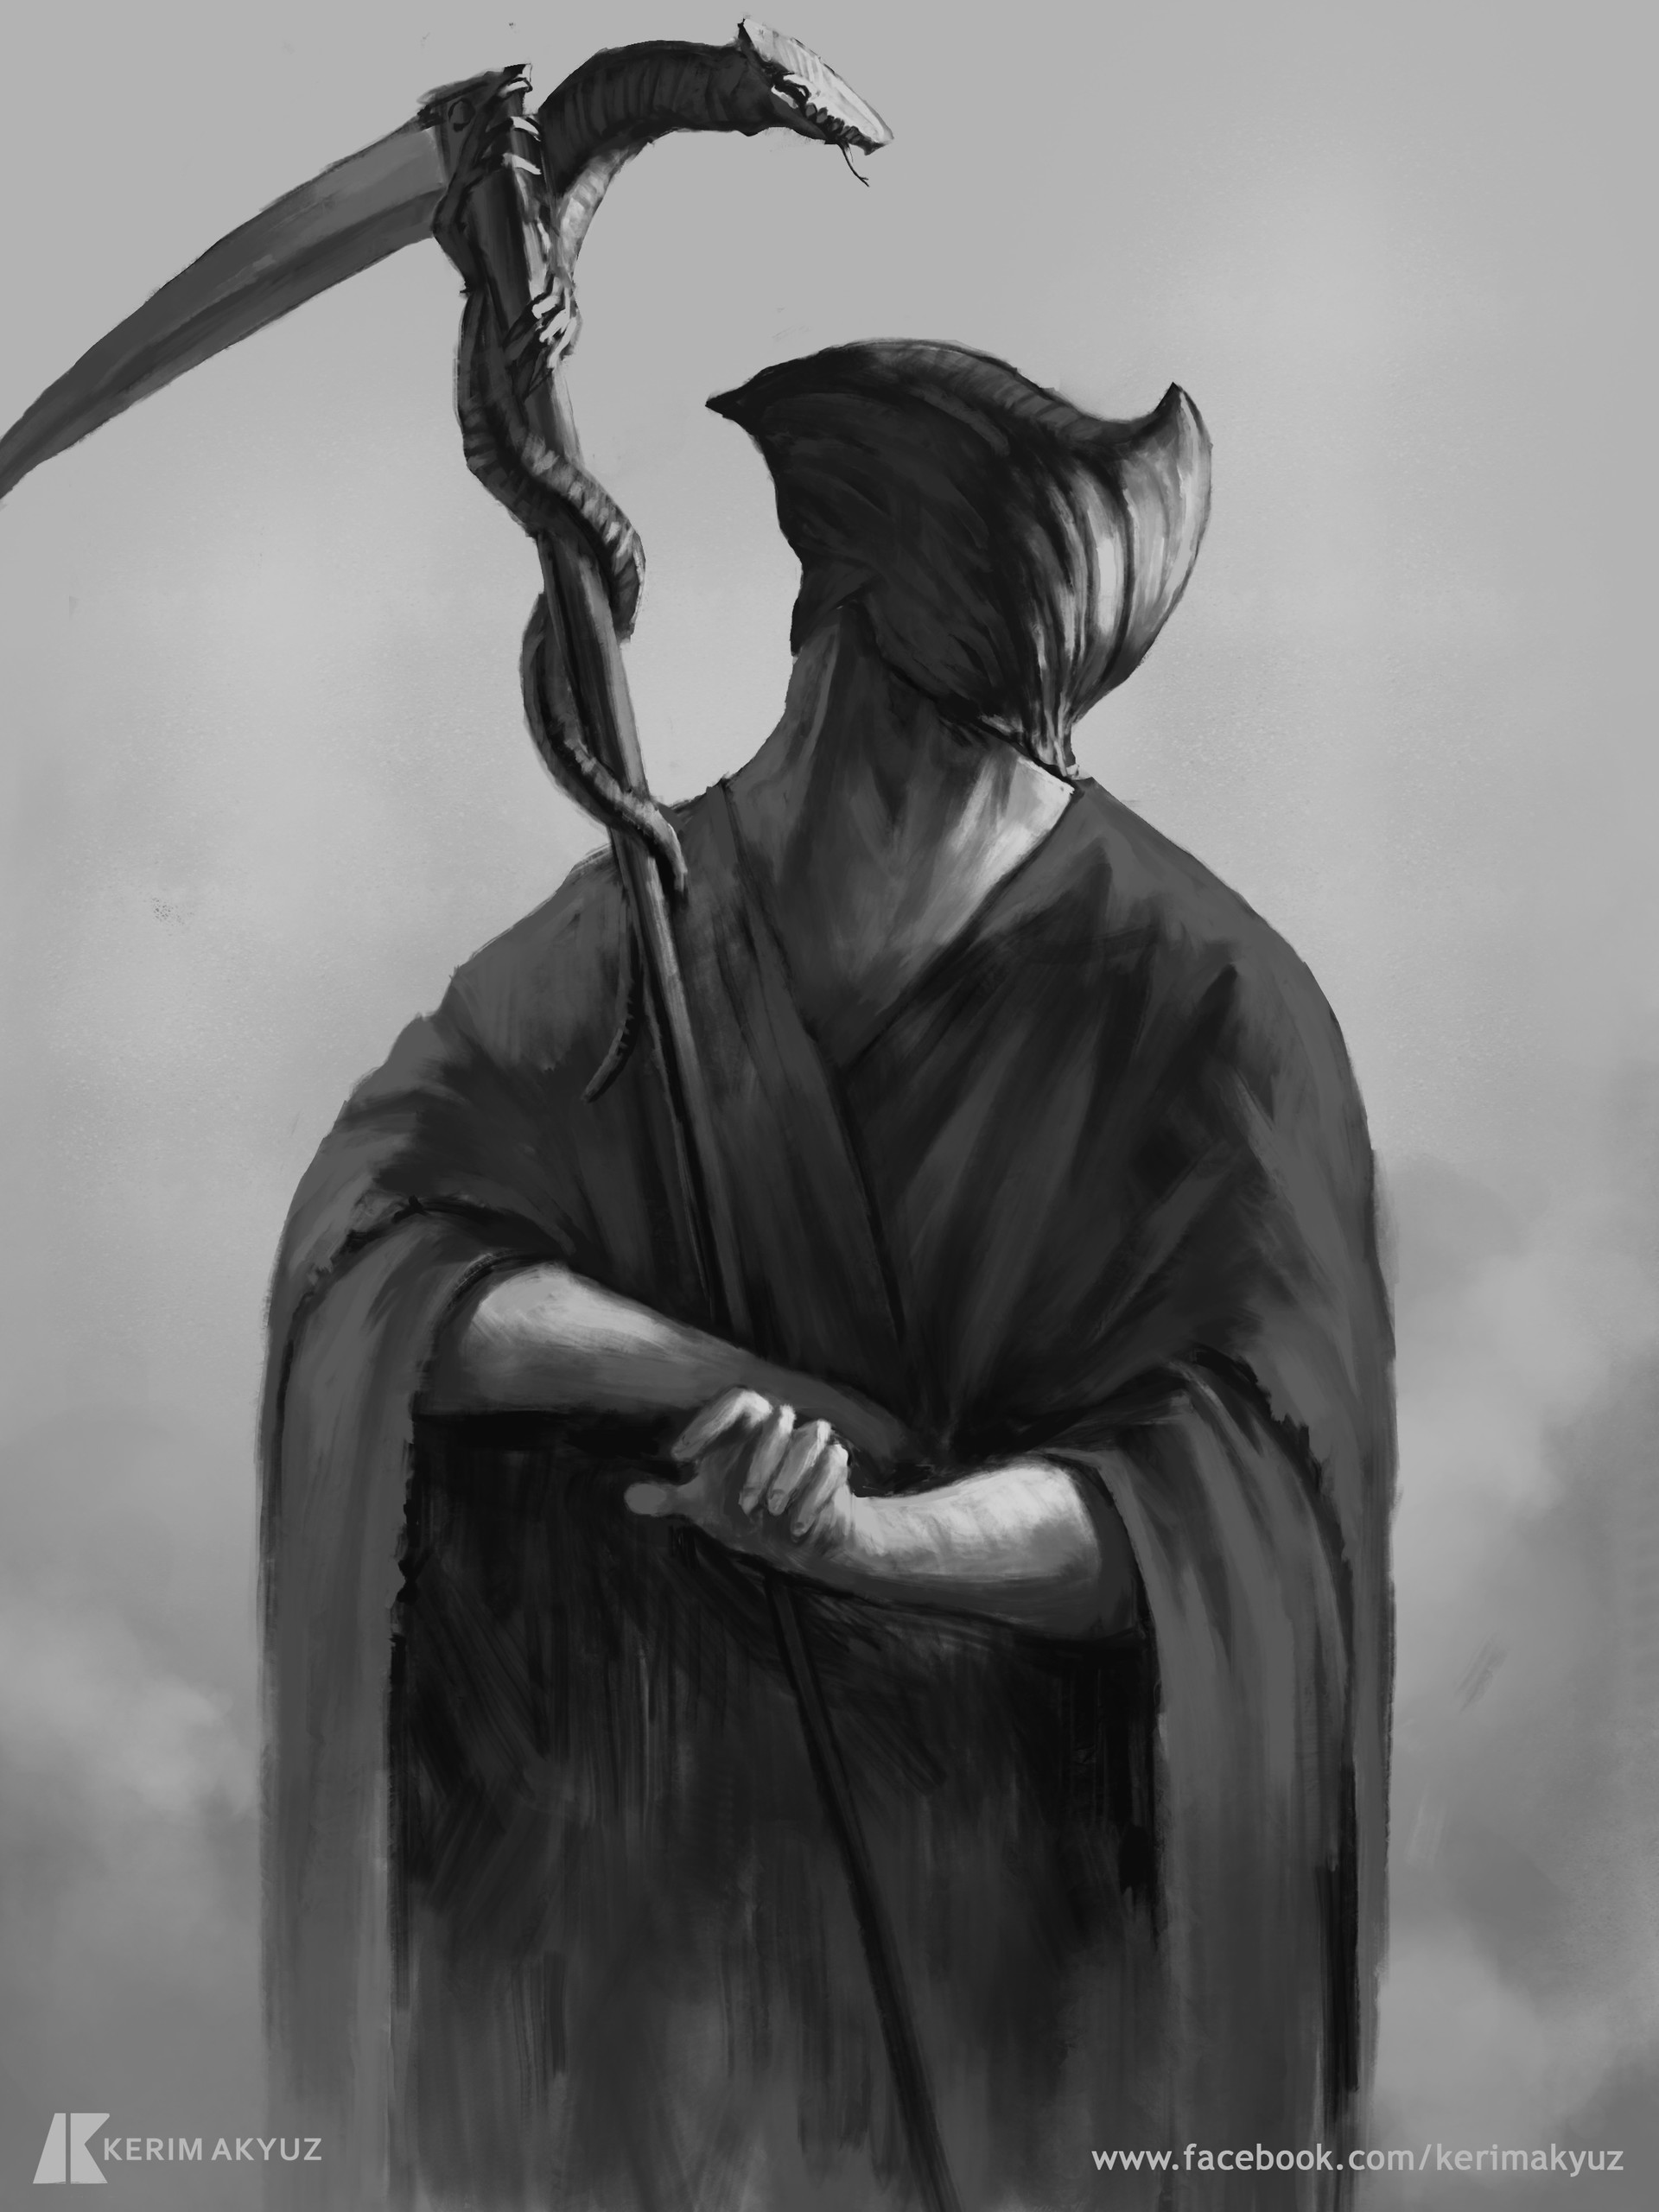 Kerim akyuz 346 serpentmaster